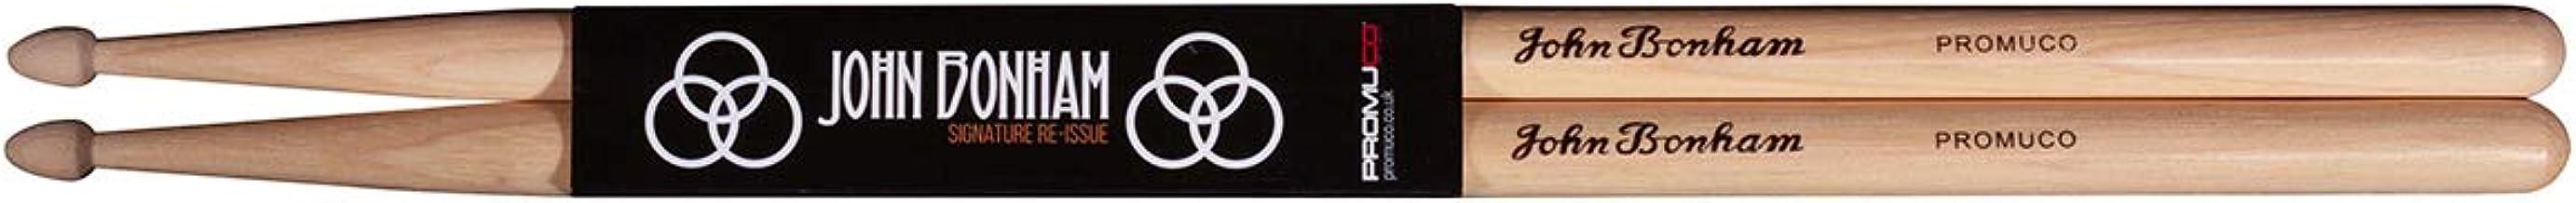 Promuco プロムコ ジョン・ボーナム シグネチャー ドラムスティック John Bonham Signature drumstick 19015JB (410mm × 15.0mm)